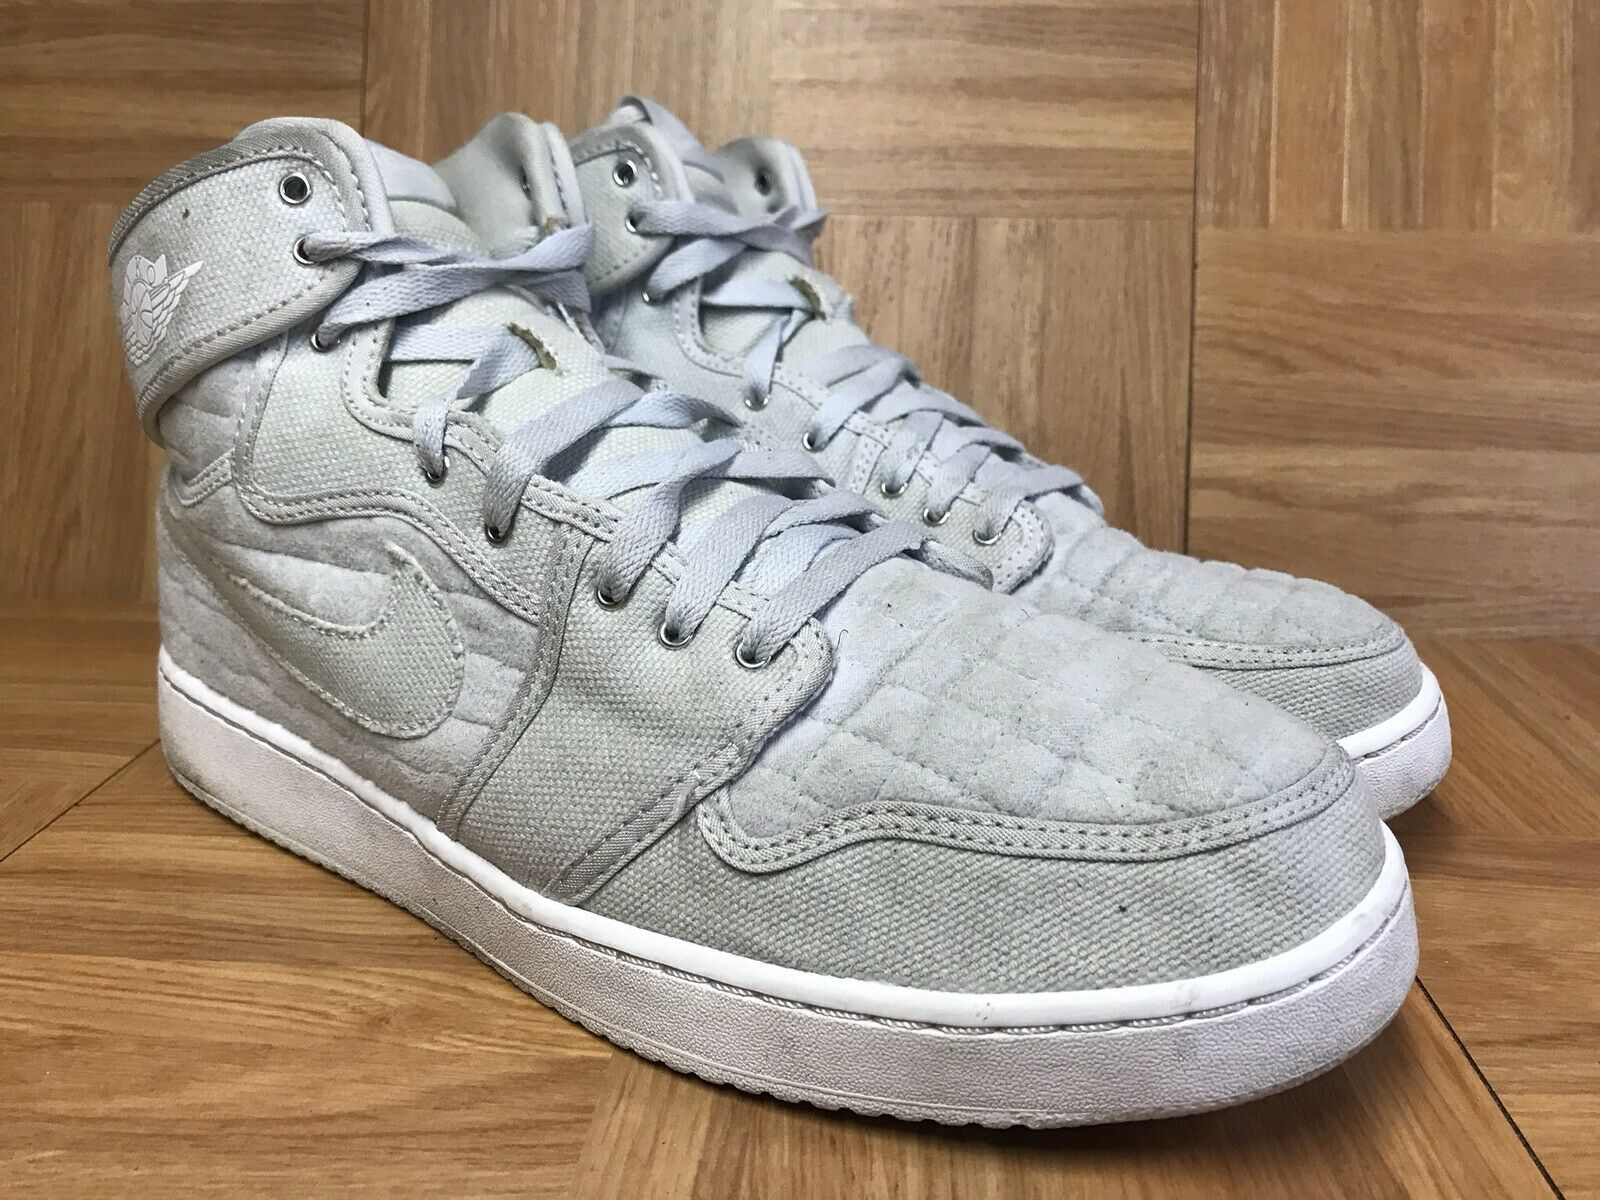 RARE Nike Air Jordan 1 KO OG Pure Platinum Quilt Silver AJKO Sz 12 638471-004